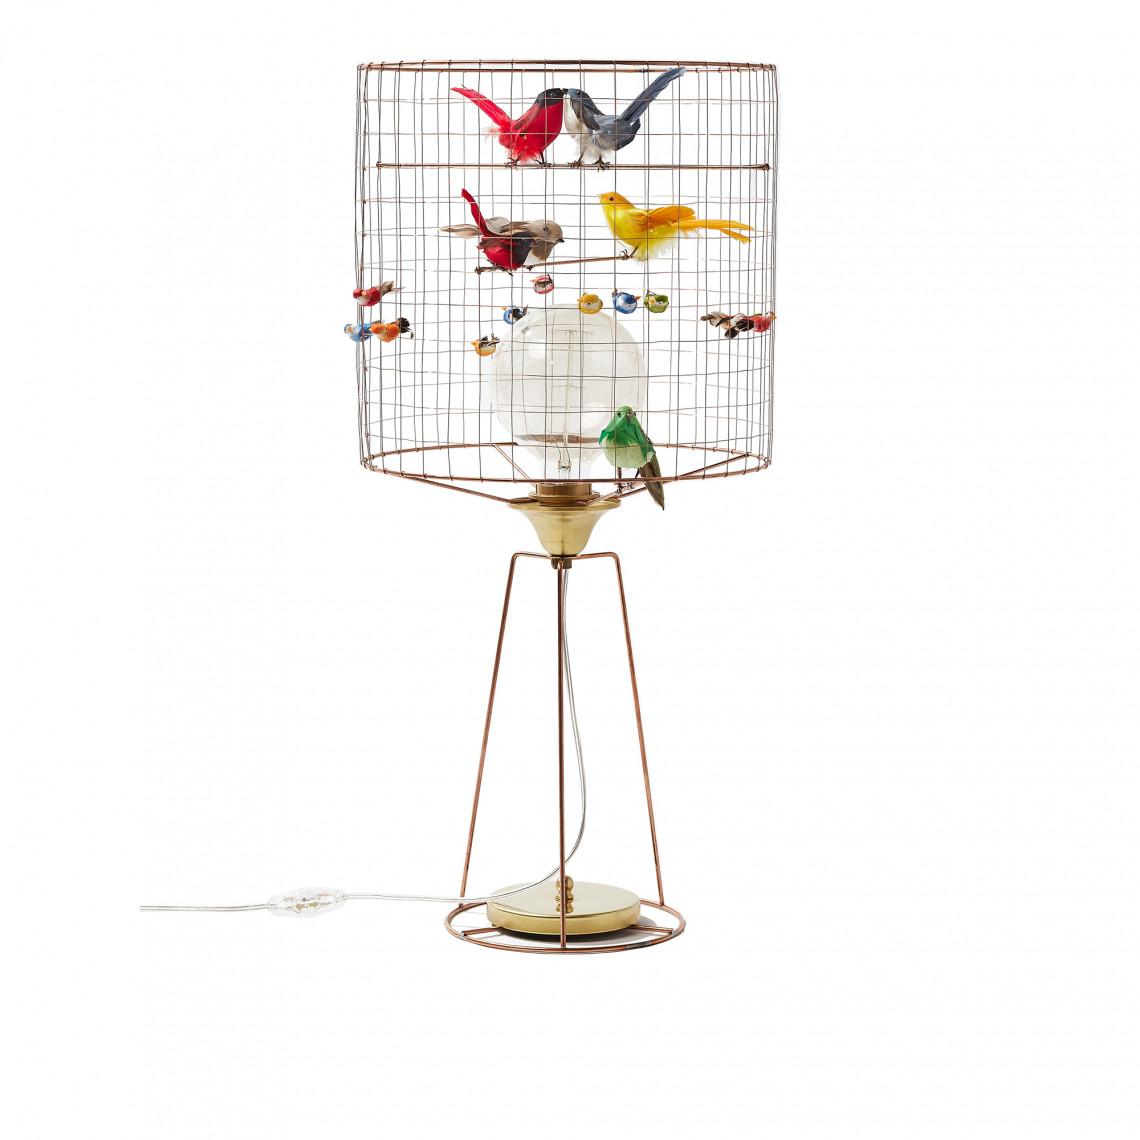 Fågellampa Lampe Volière Haute